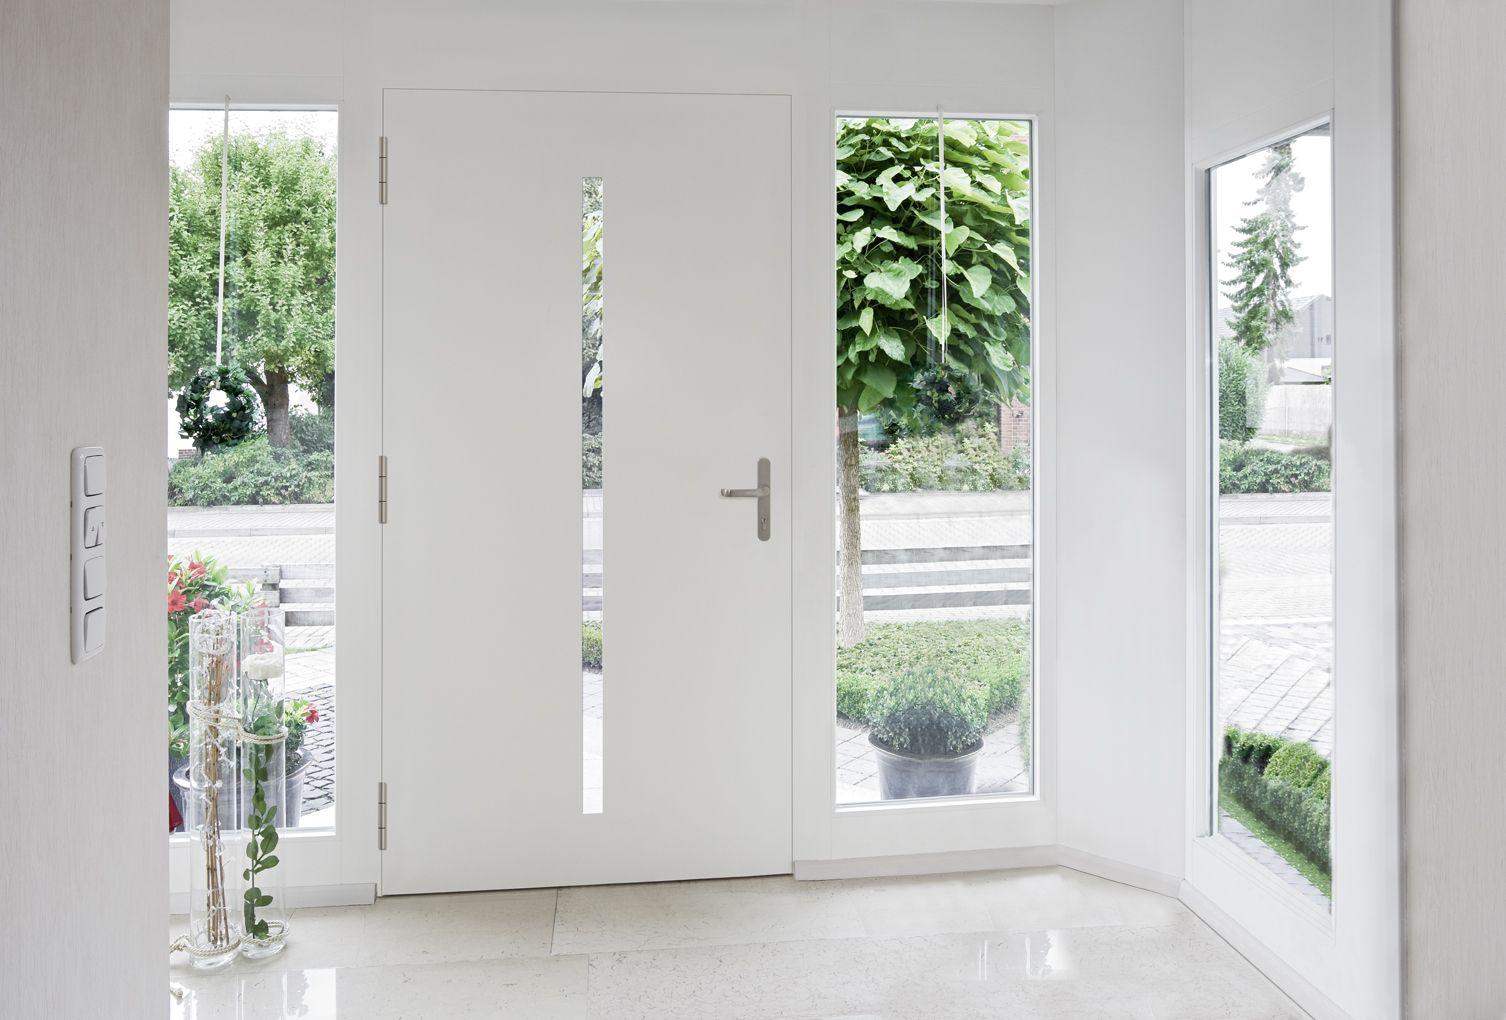 haust r innen wei haust re pinterest haust ren t ren und eingang. Black Bedroom Furniture Sets. Home Design Ideas